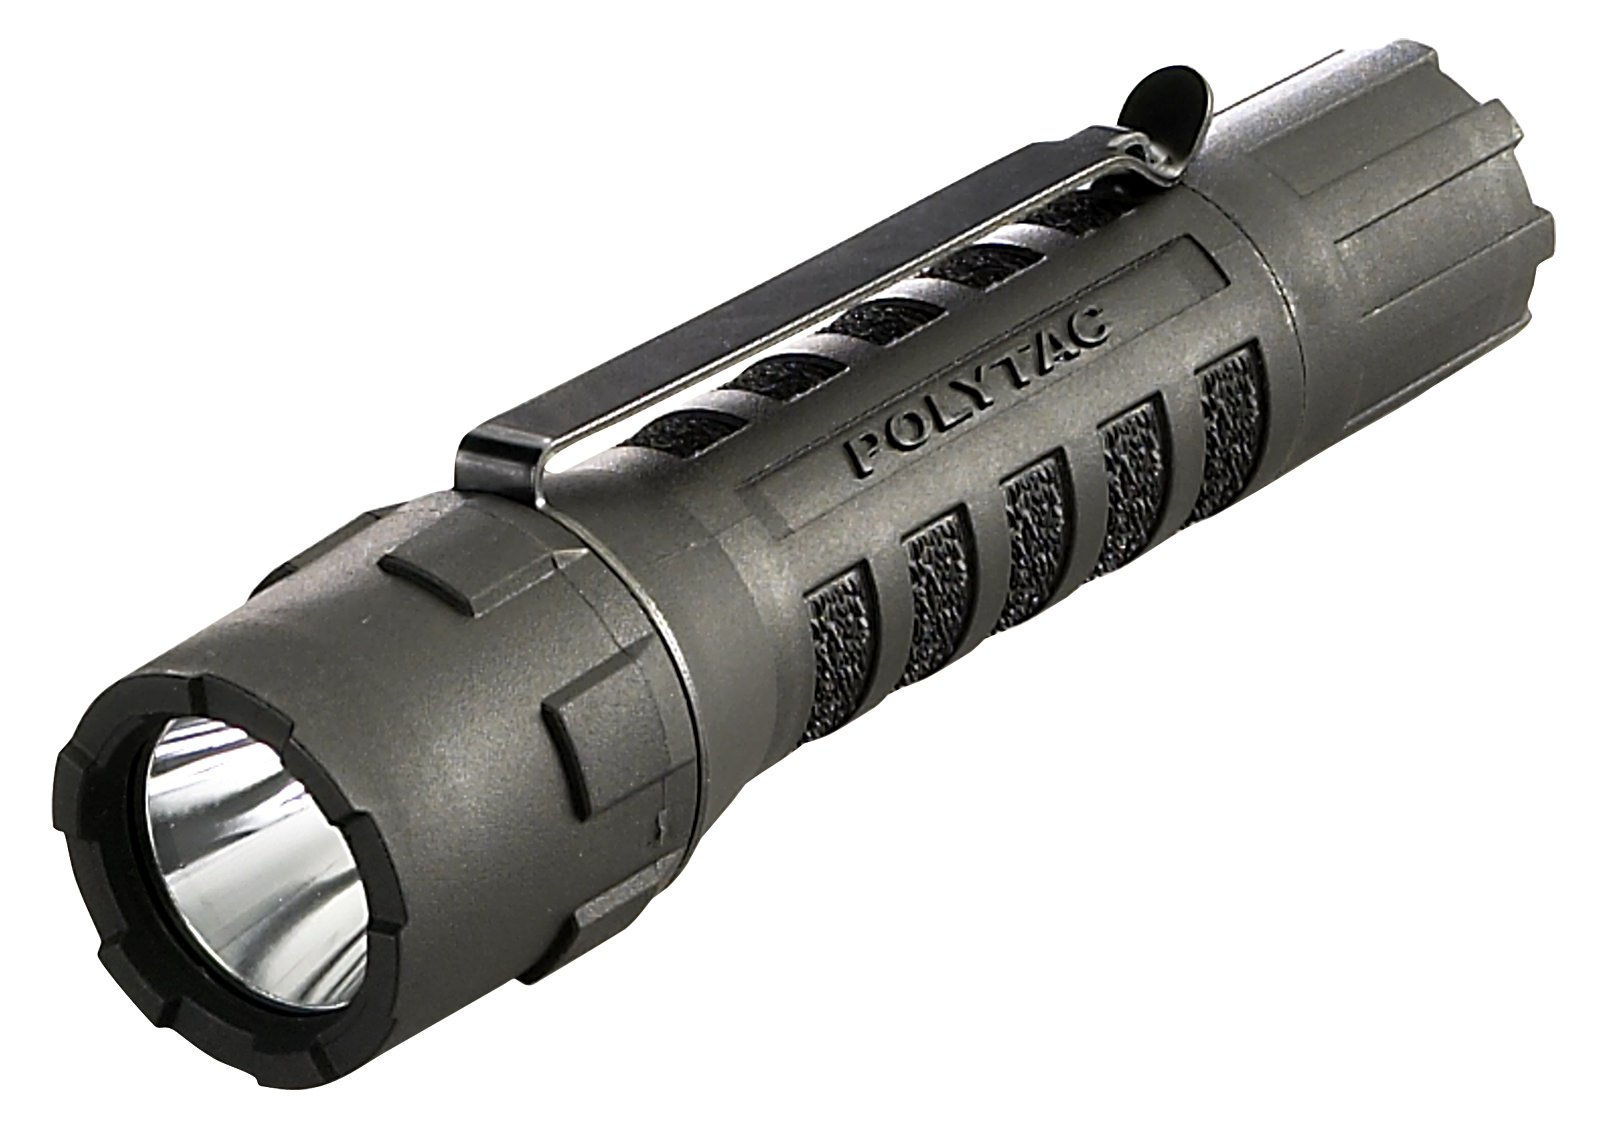 Streamlight PolyTac All Purpose, Sure Grip LED Flashlight by Streamlight